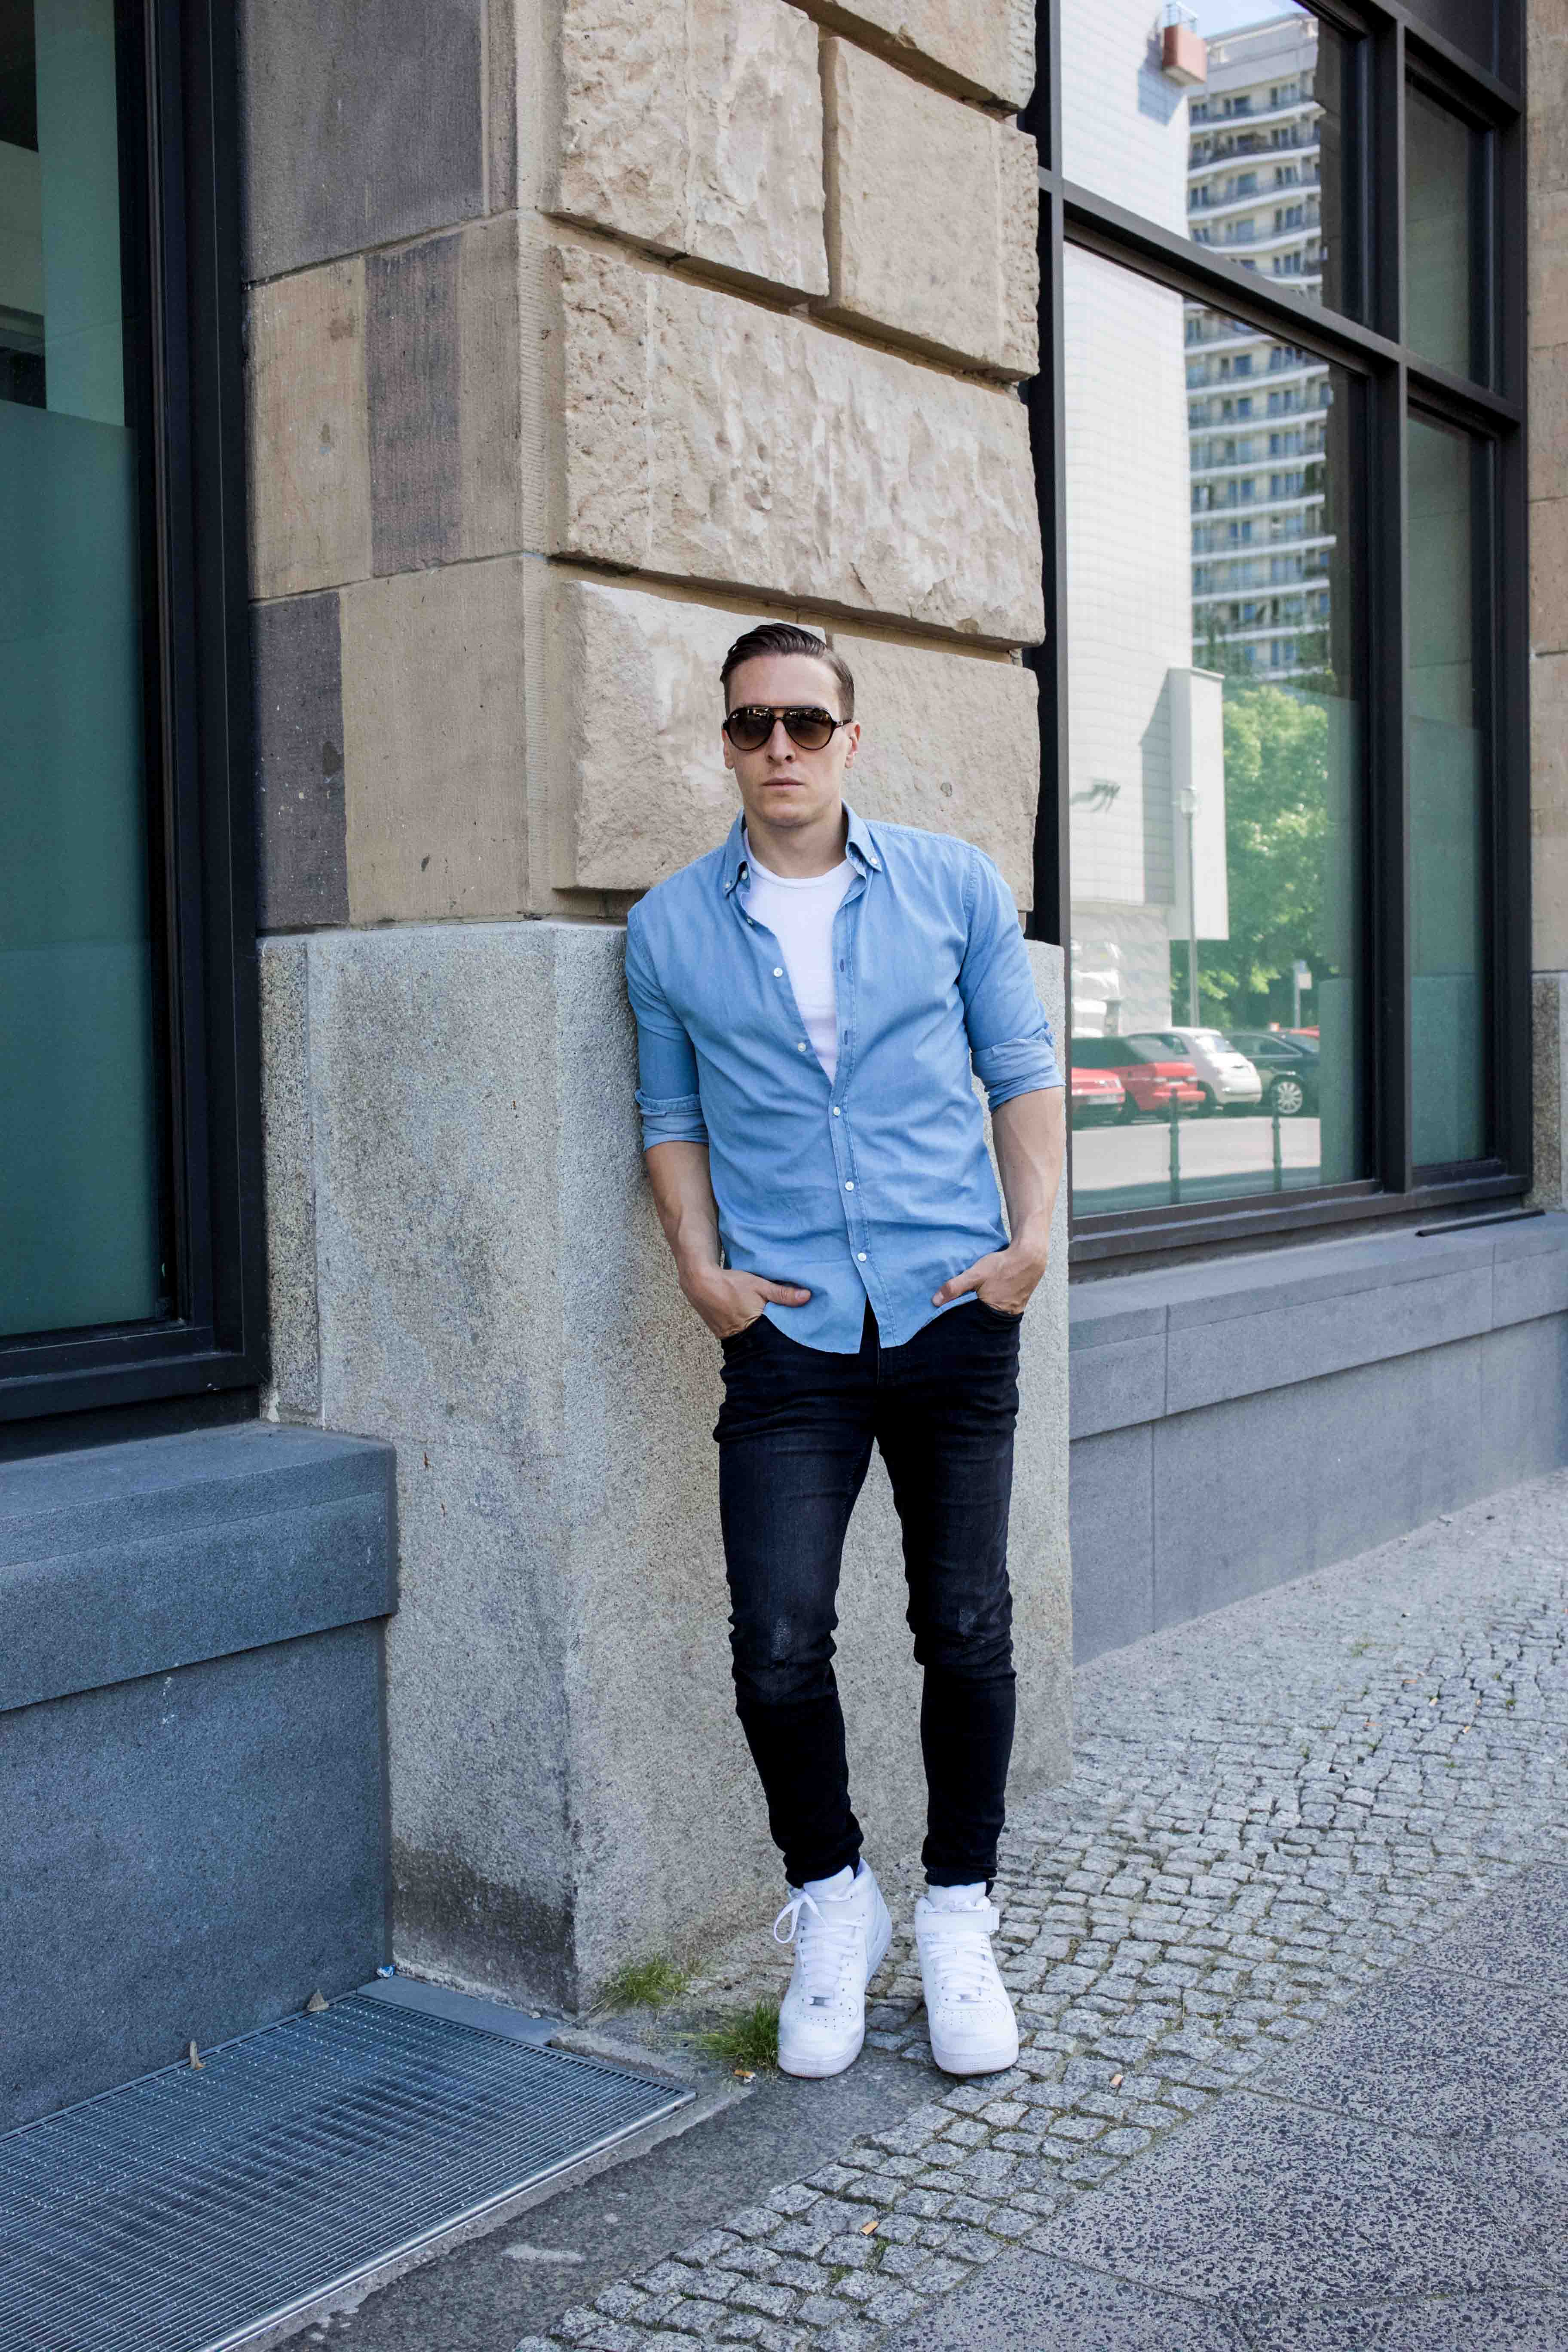 hellblaues-freizeitshirt-rayban-cats-destroyed-skinny-jeans-männerblog-menfashion-fashionblog_7815